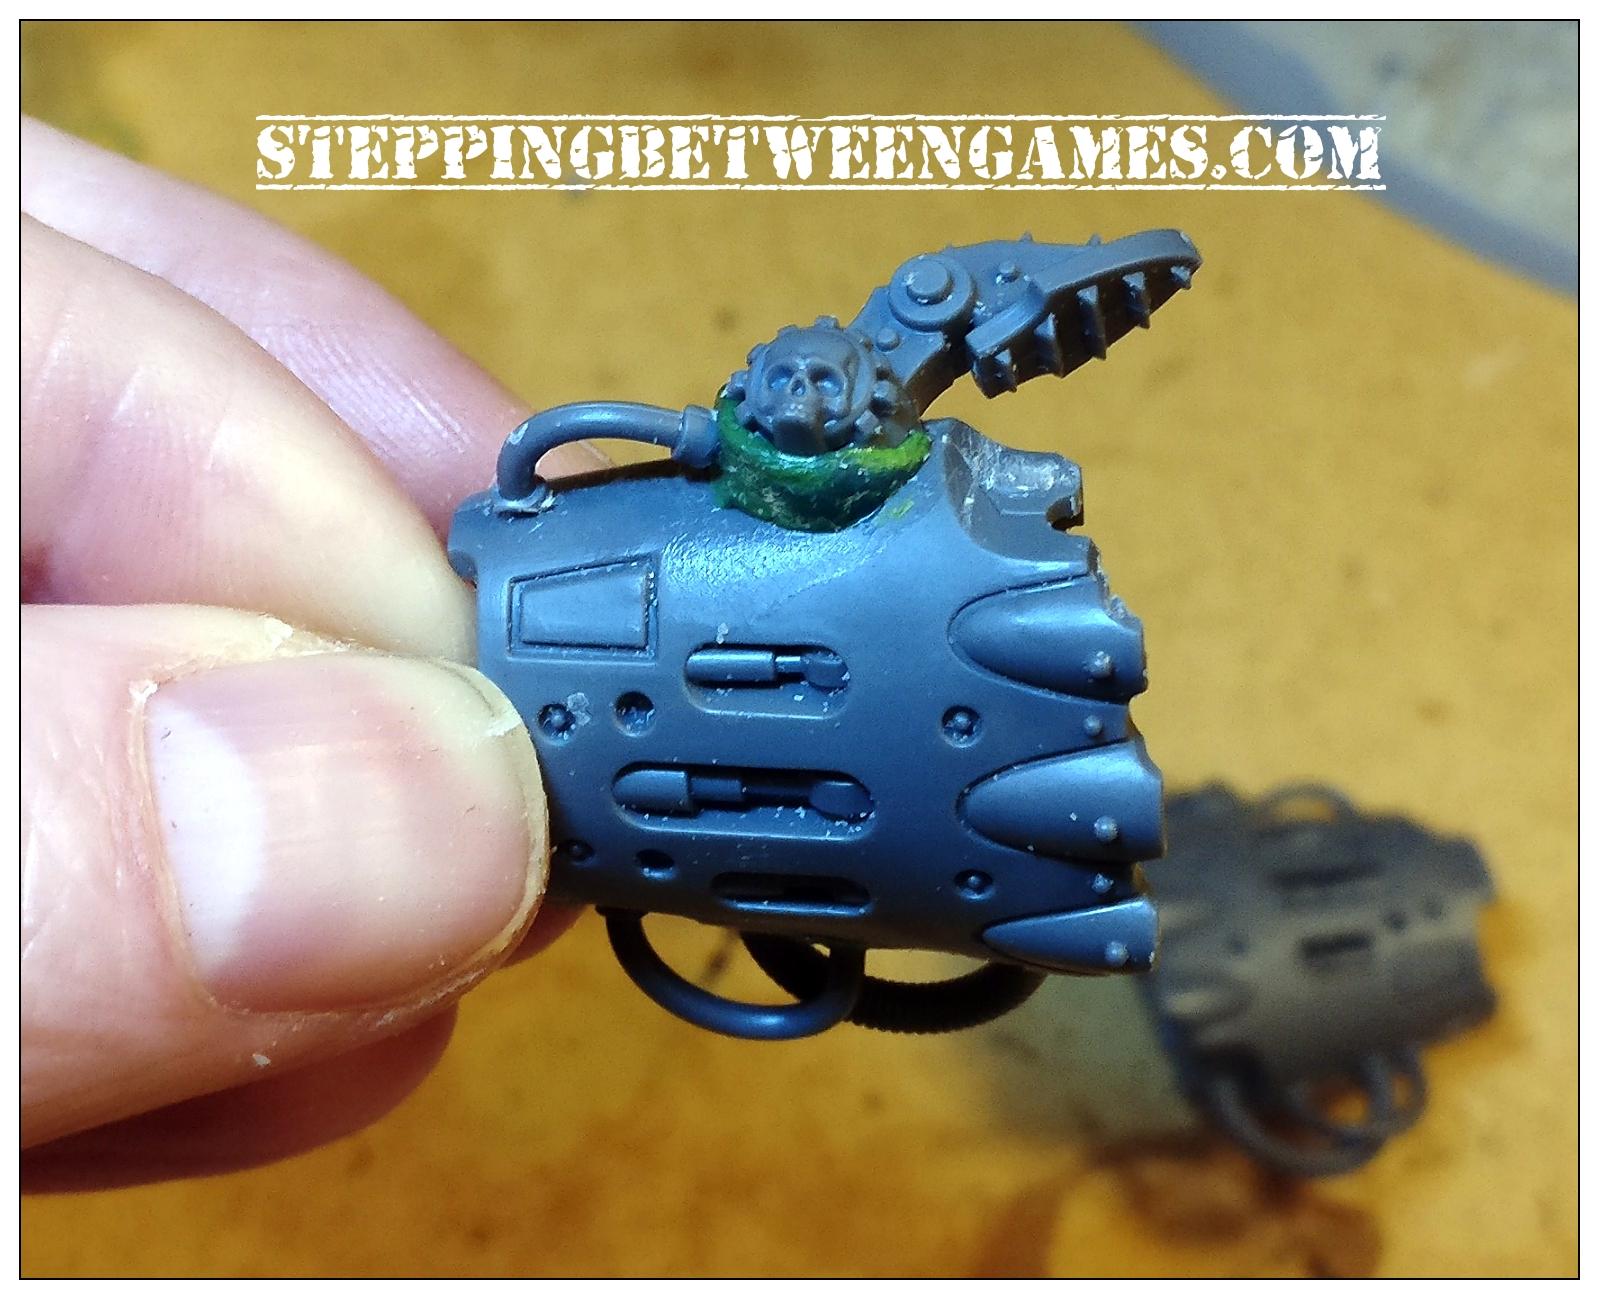 Thunderstrike gauntlet right hand conversion - thumb detail